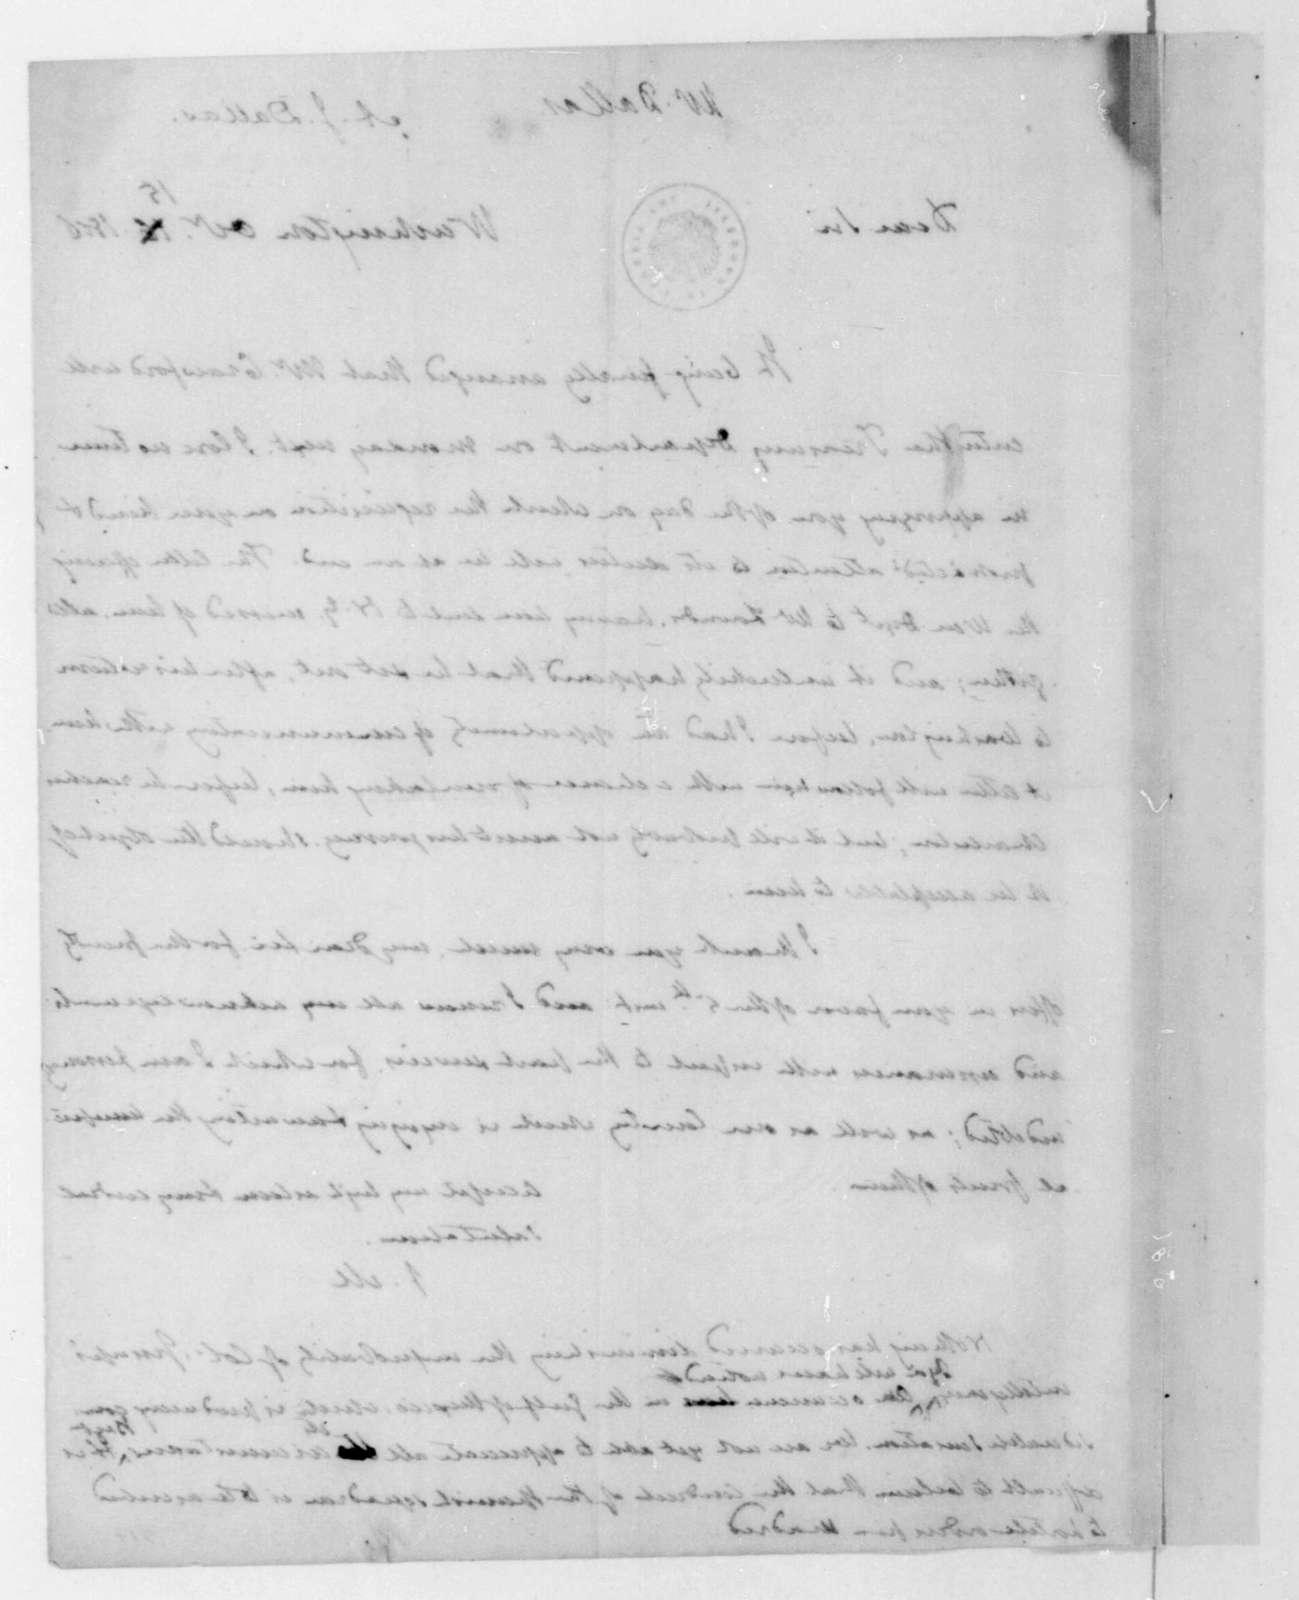 James Madison to Alexander J. Dallas, October 15, 1816.